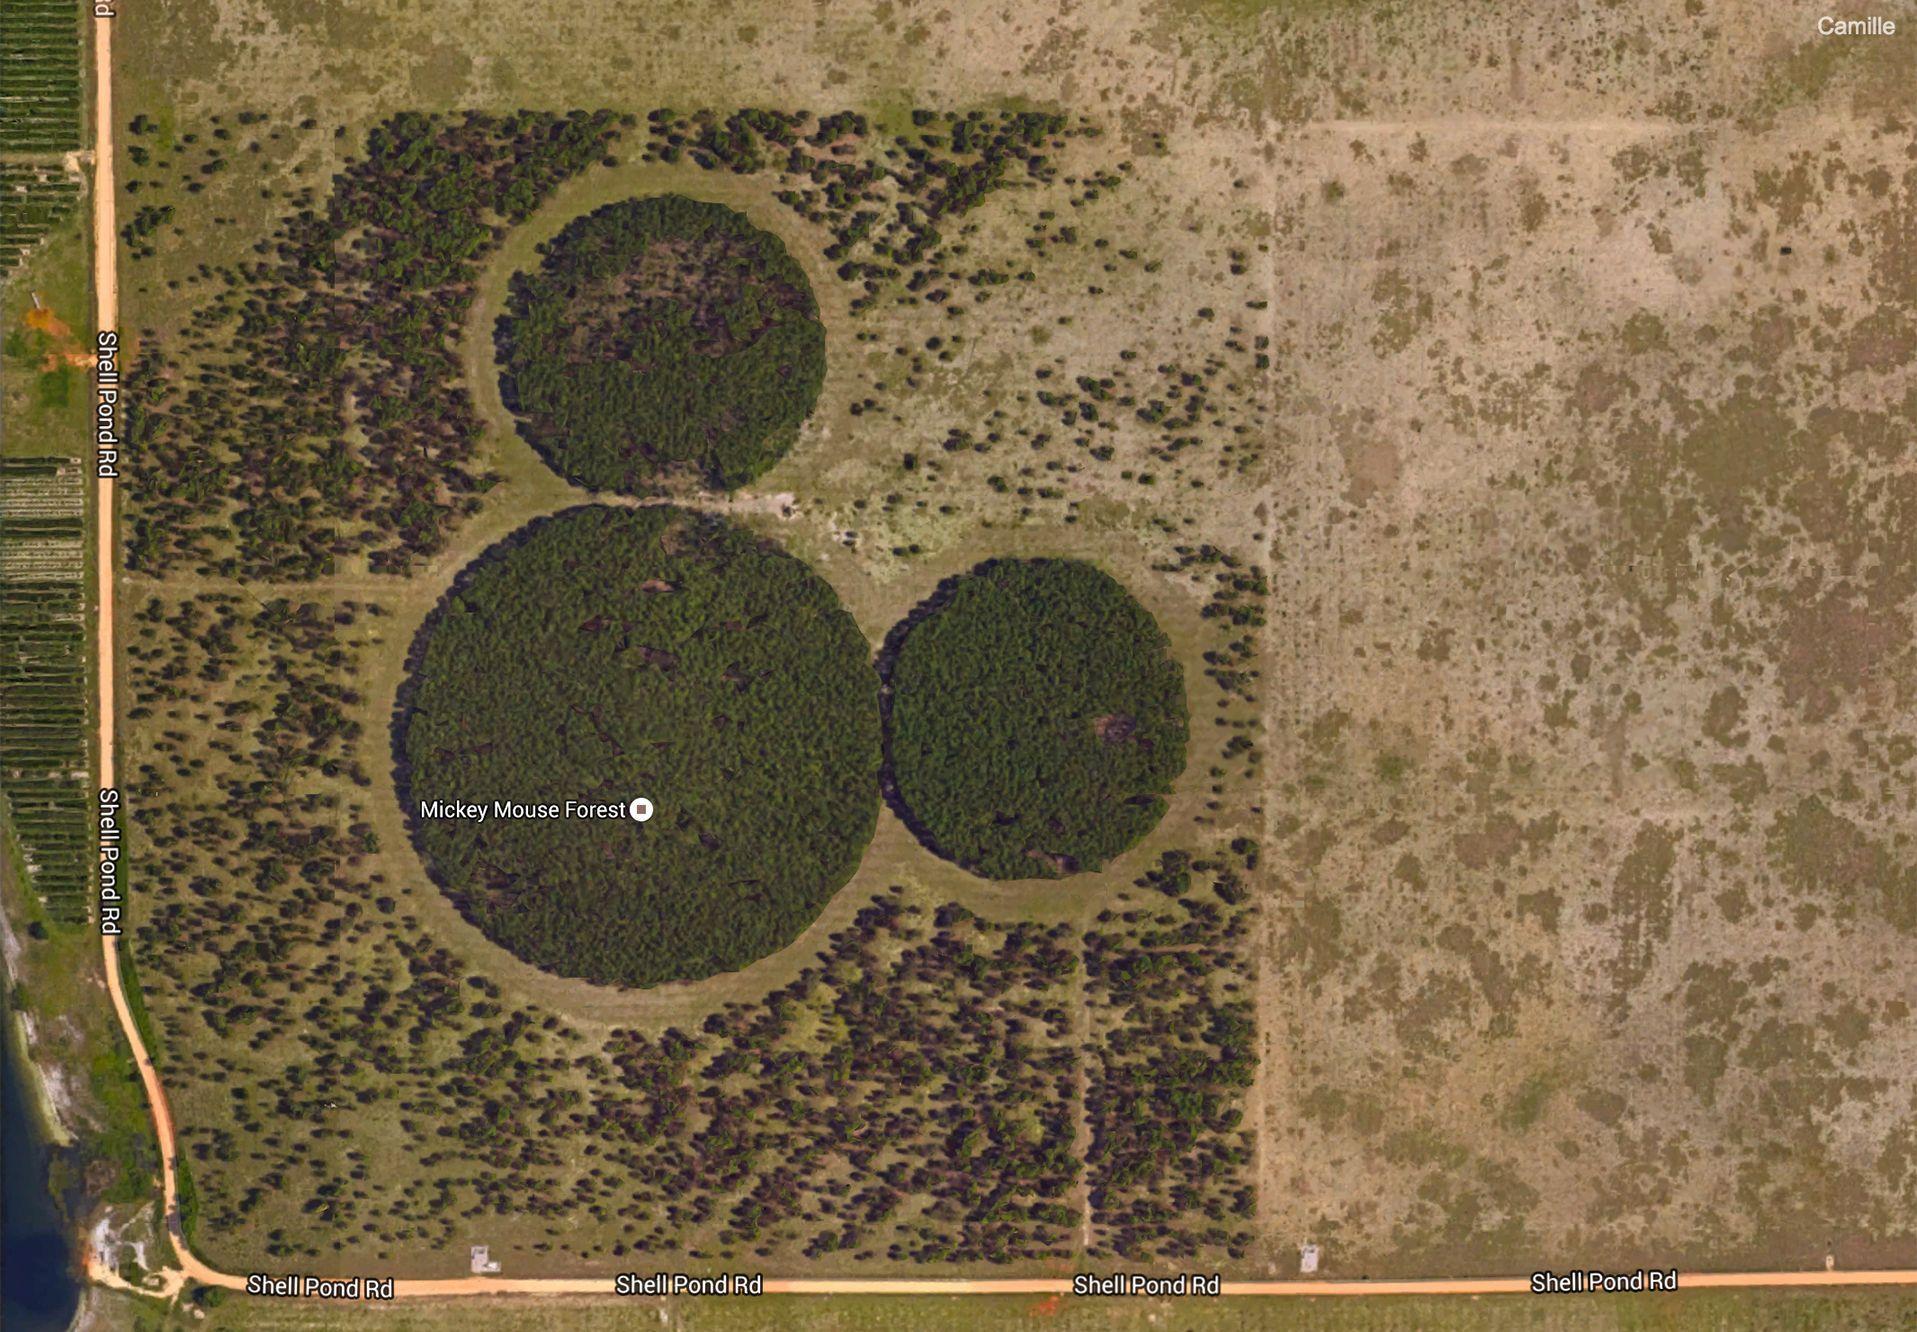 La forêt Mickey près d'Orlando en Floride